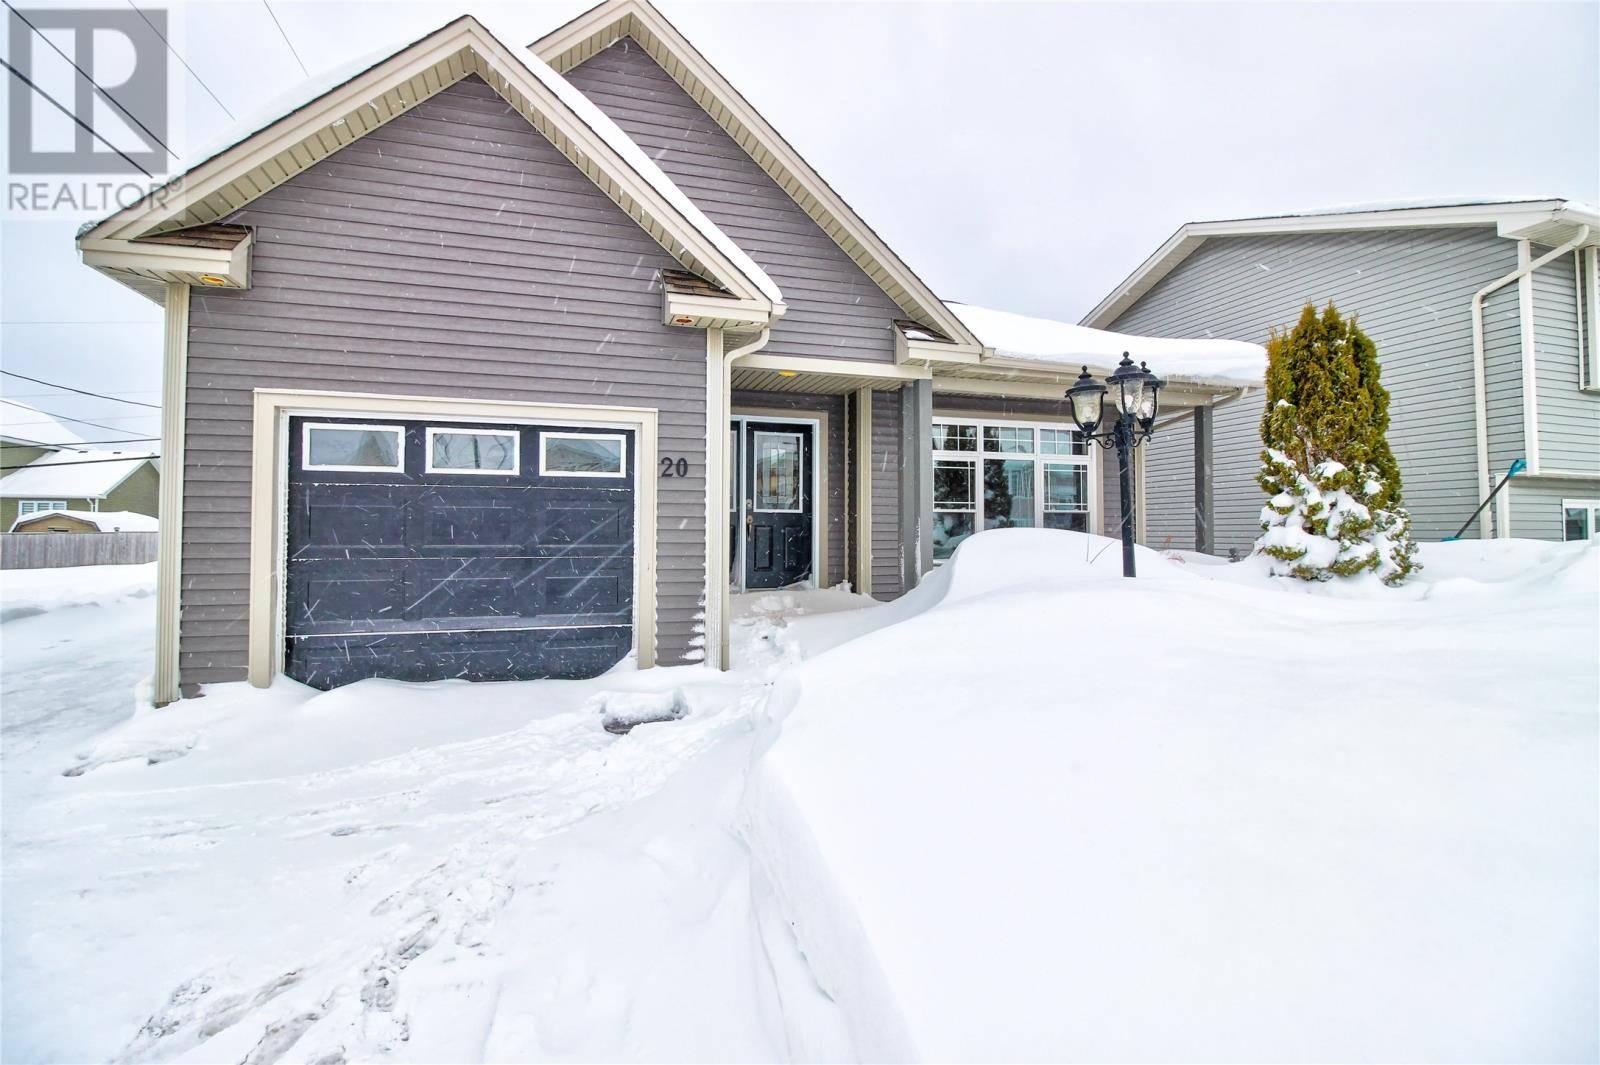 House for sale at 20 Gil Eannes Dr St. John's Newfoundland - MLS: 1209174